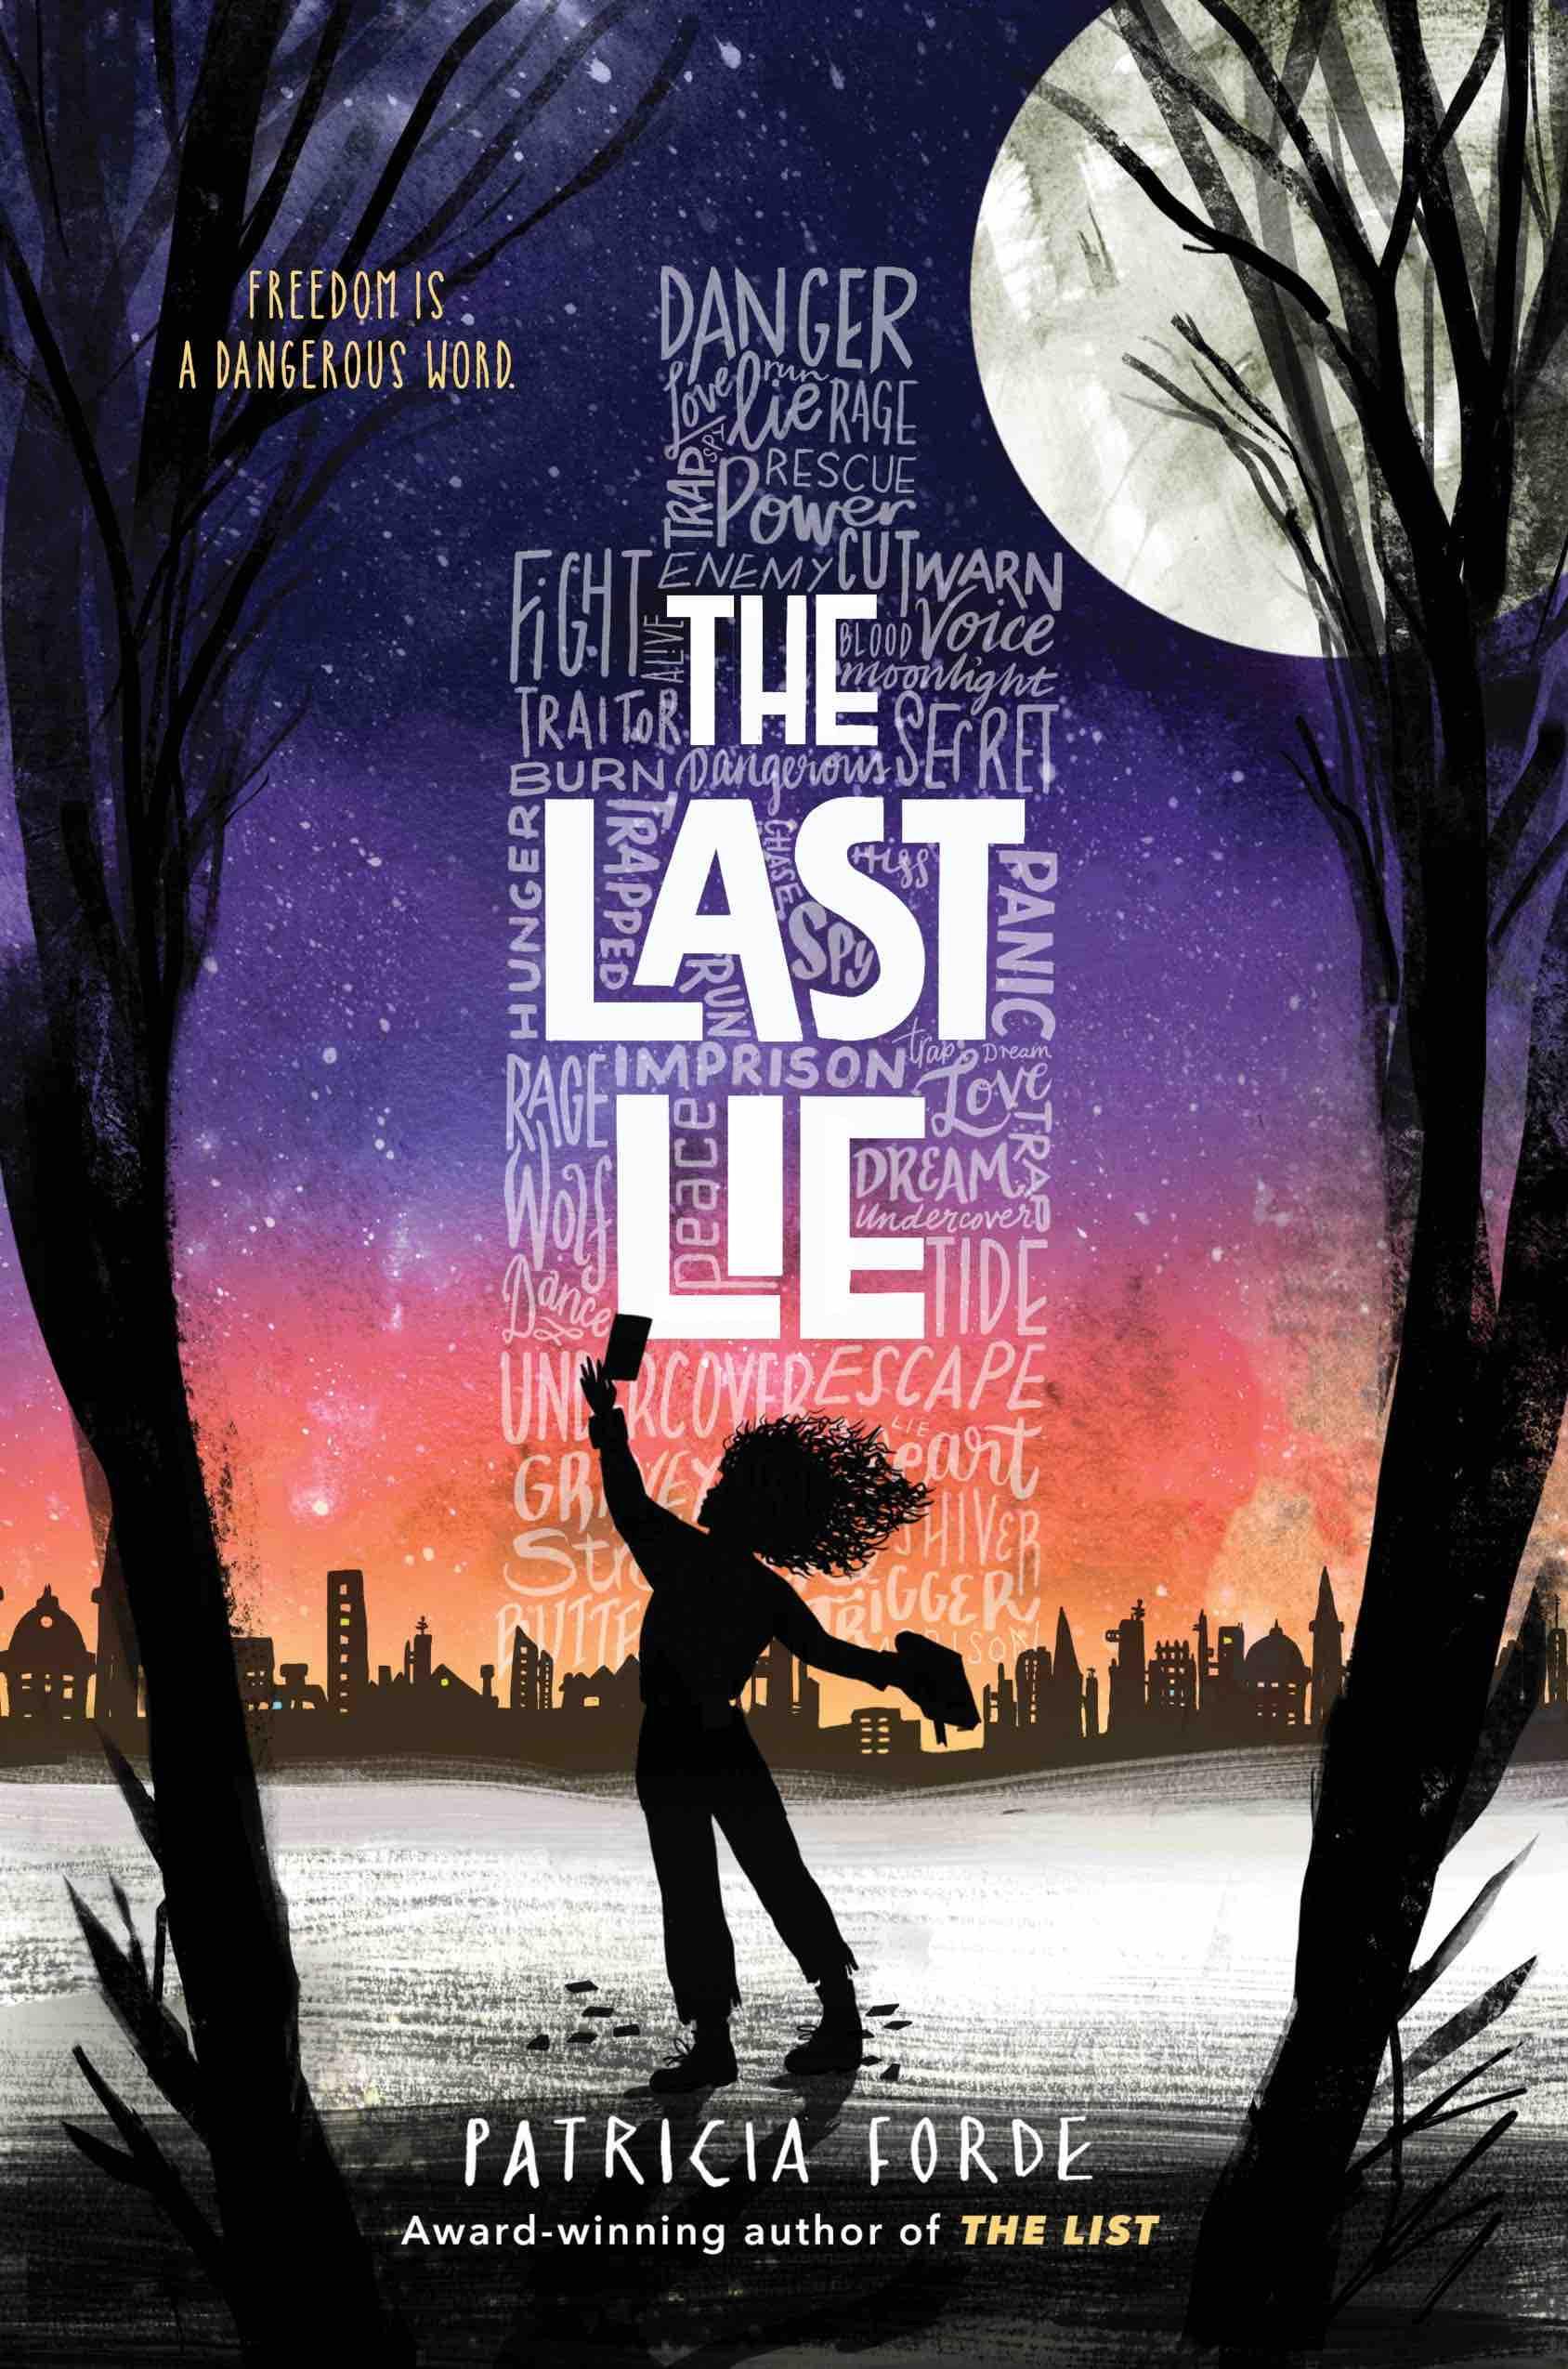 Last Lie Patricia Forde